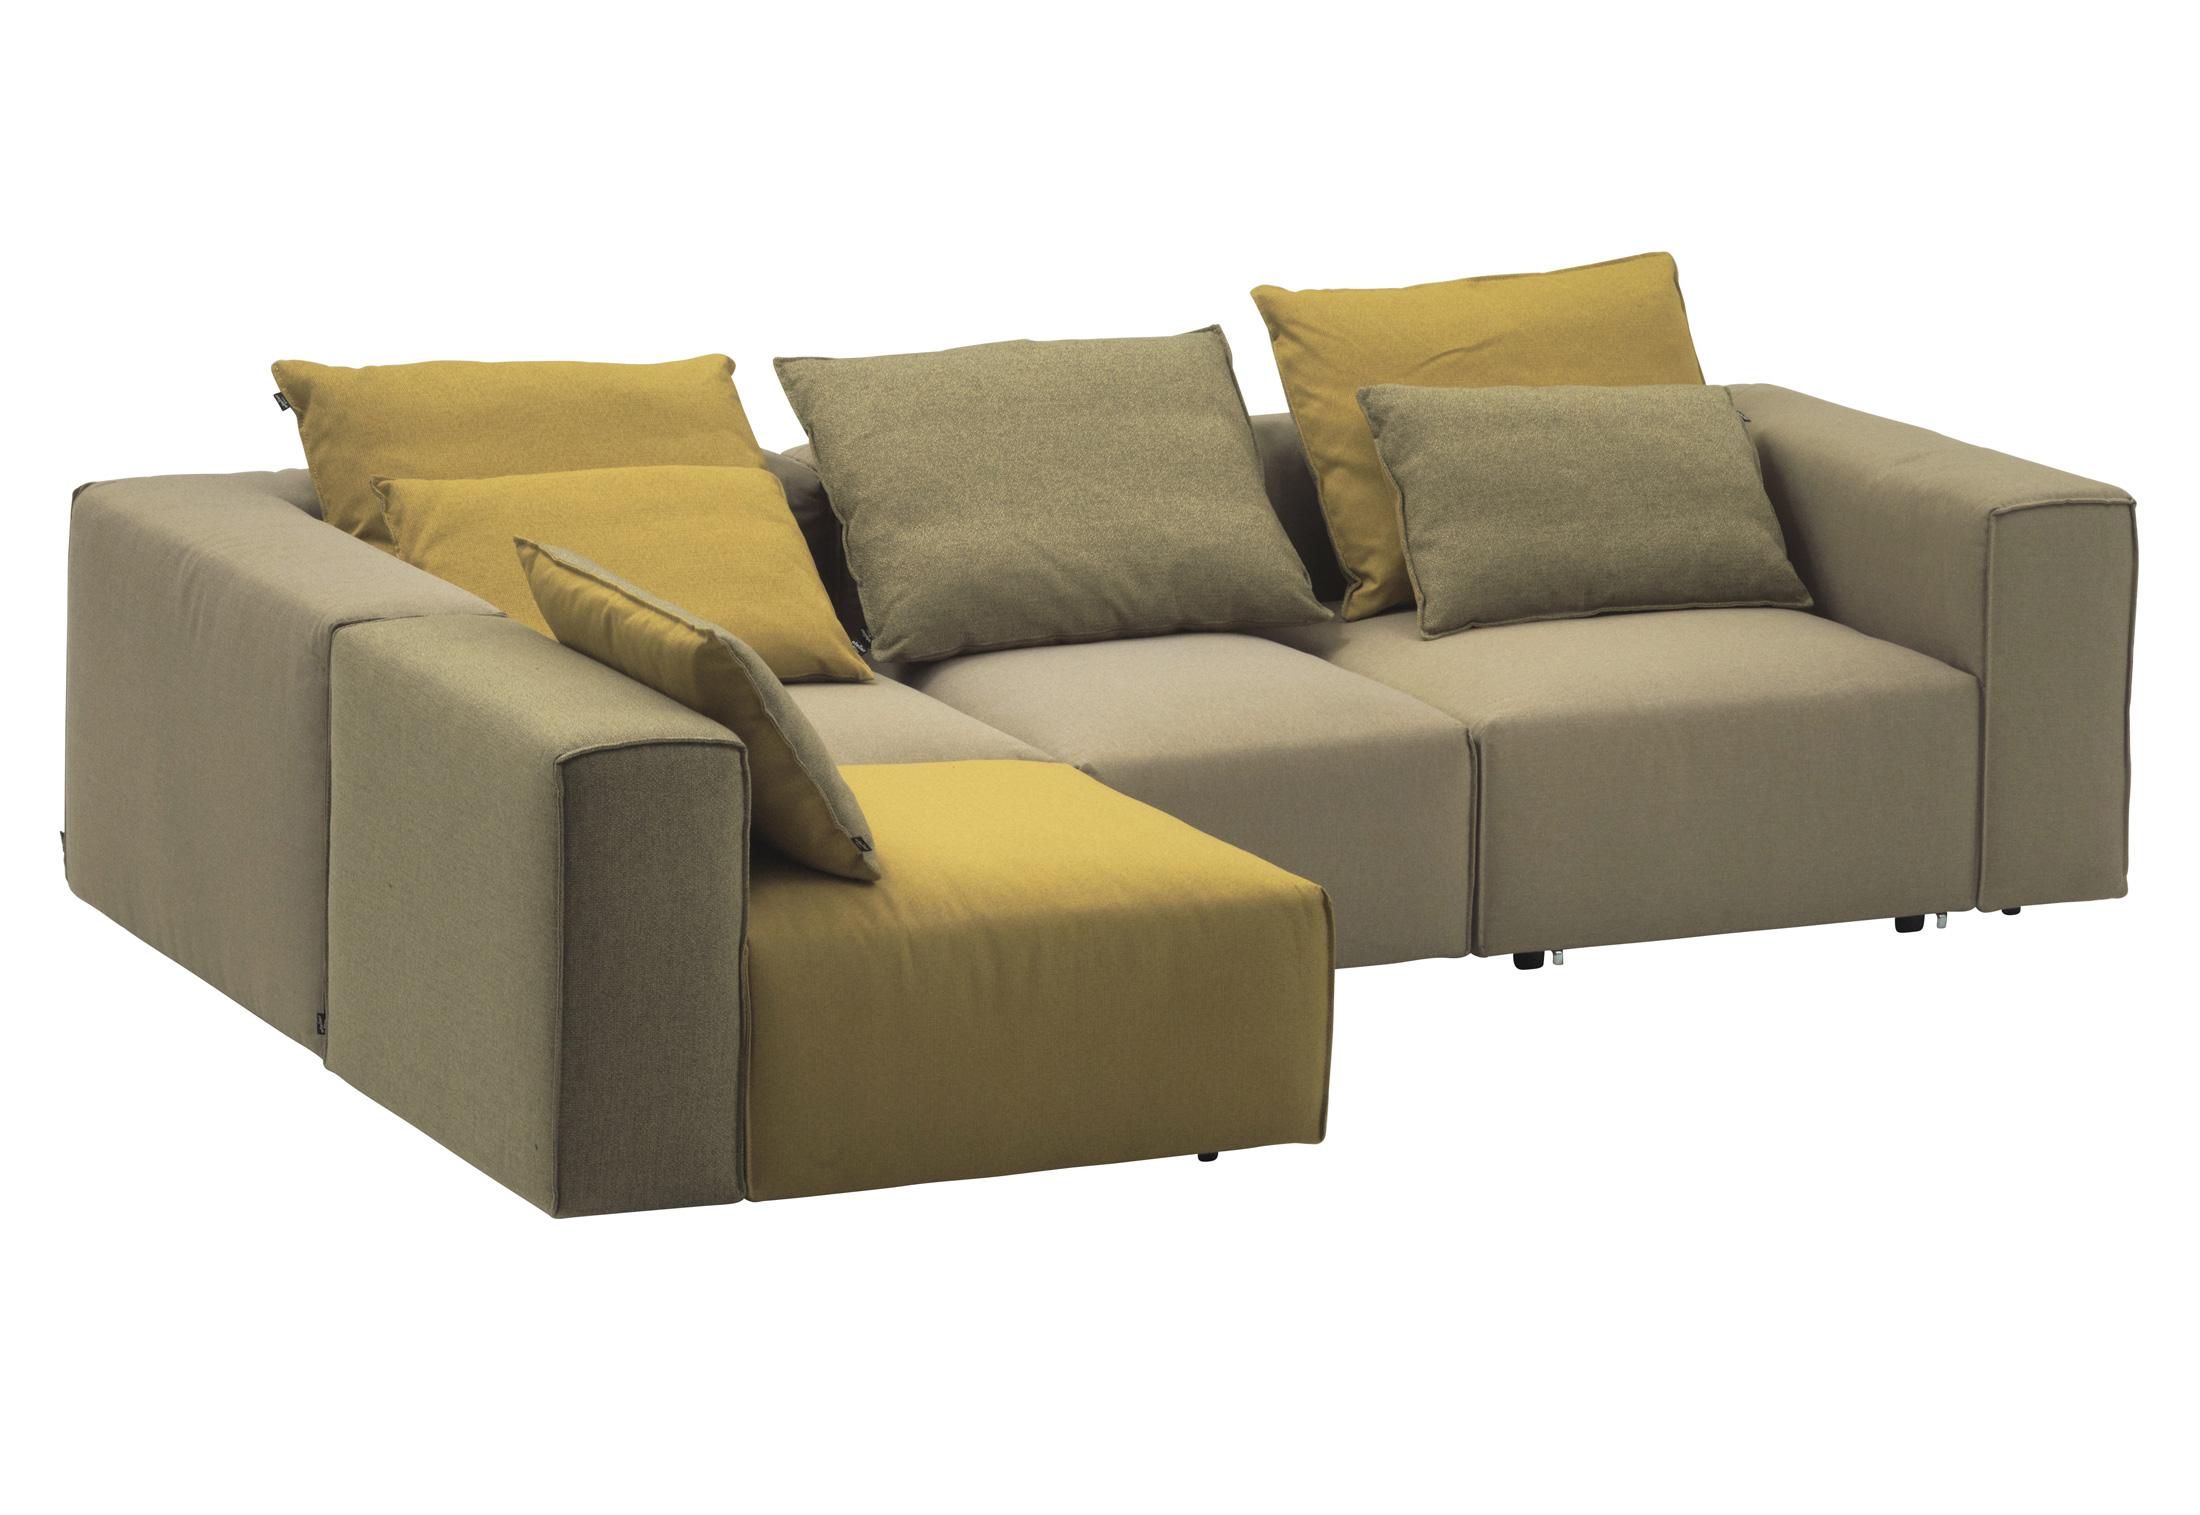 Möbel Pfister Sofa - Möbel bild